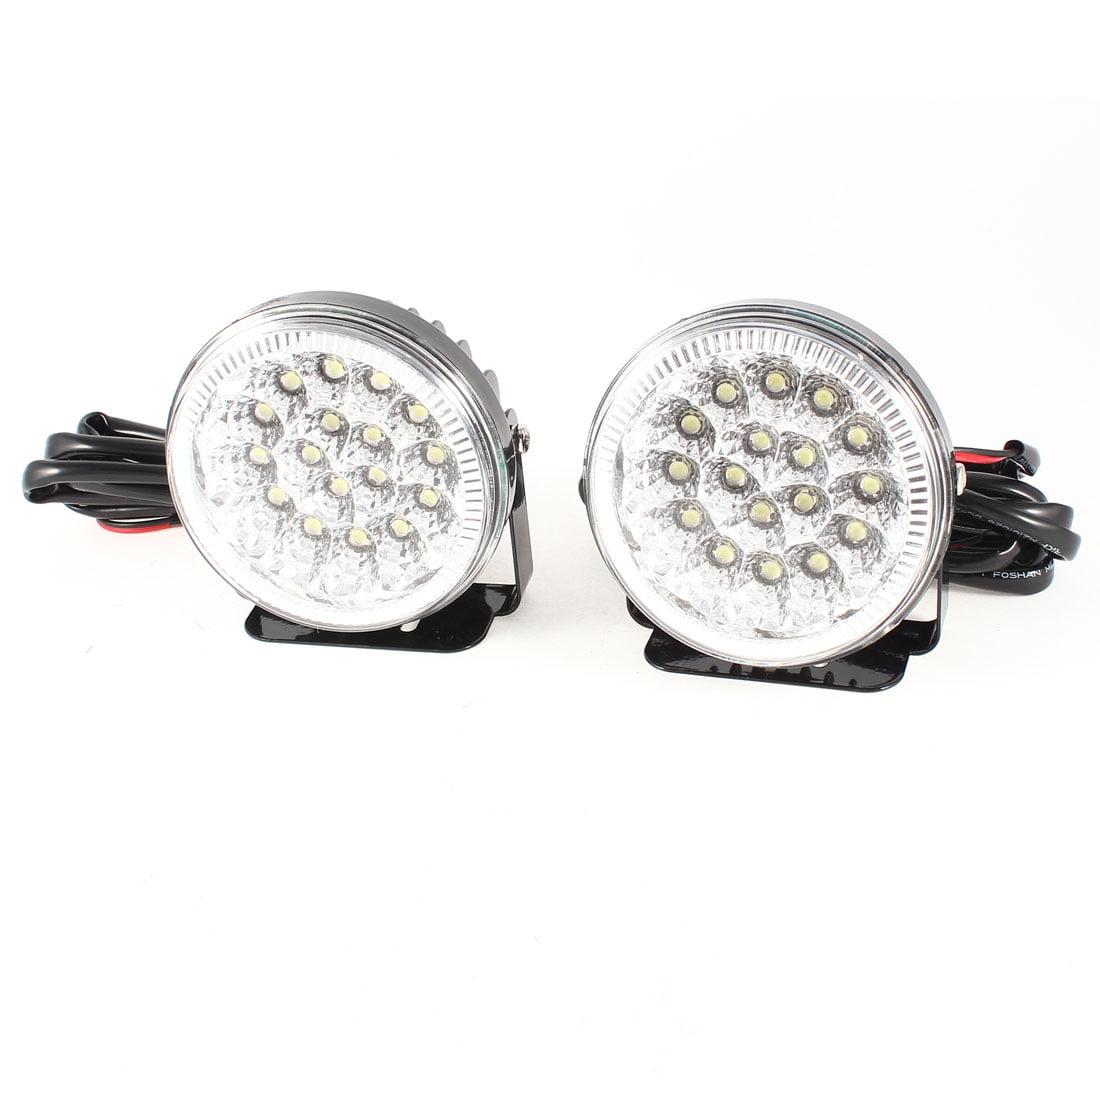 Unique Bargains Car Black Bracket Silver Tone White 17 LEDs Round Dome Lamp Decor DC 12V